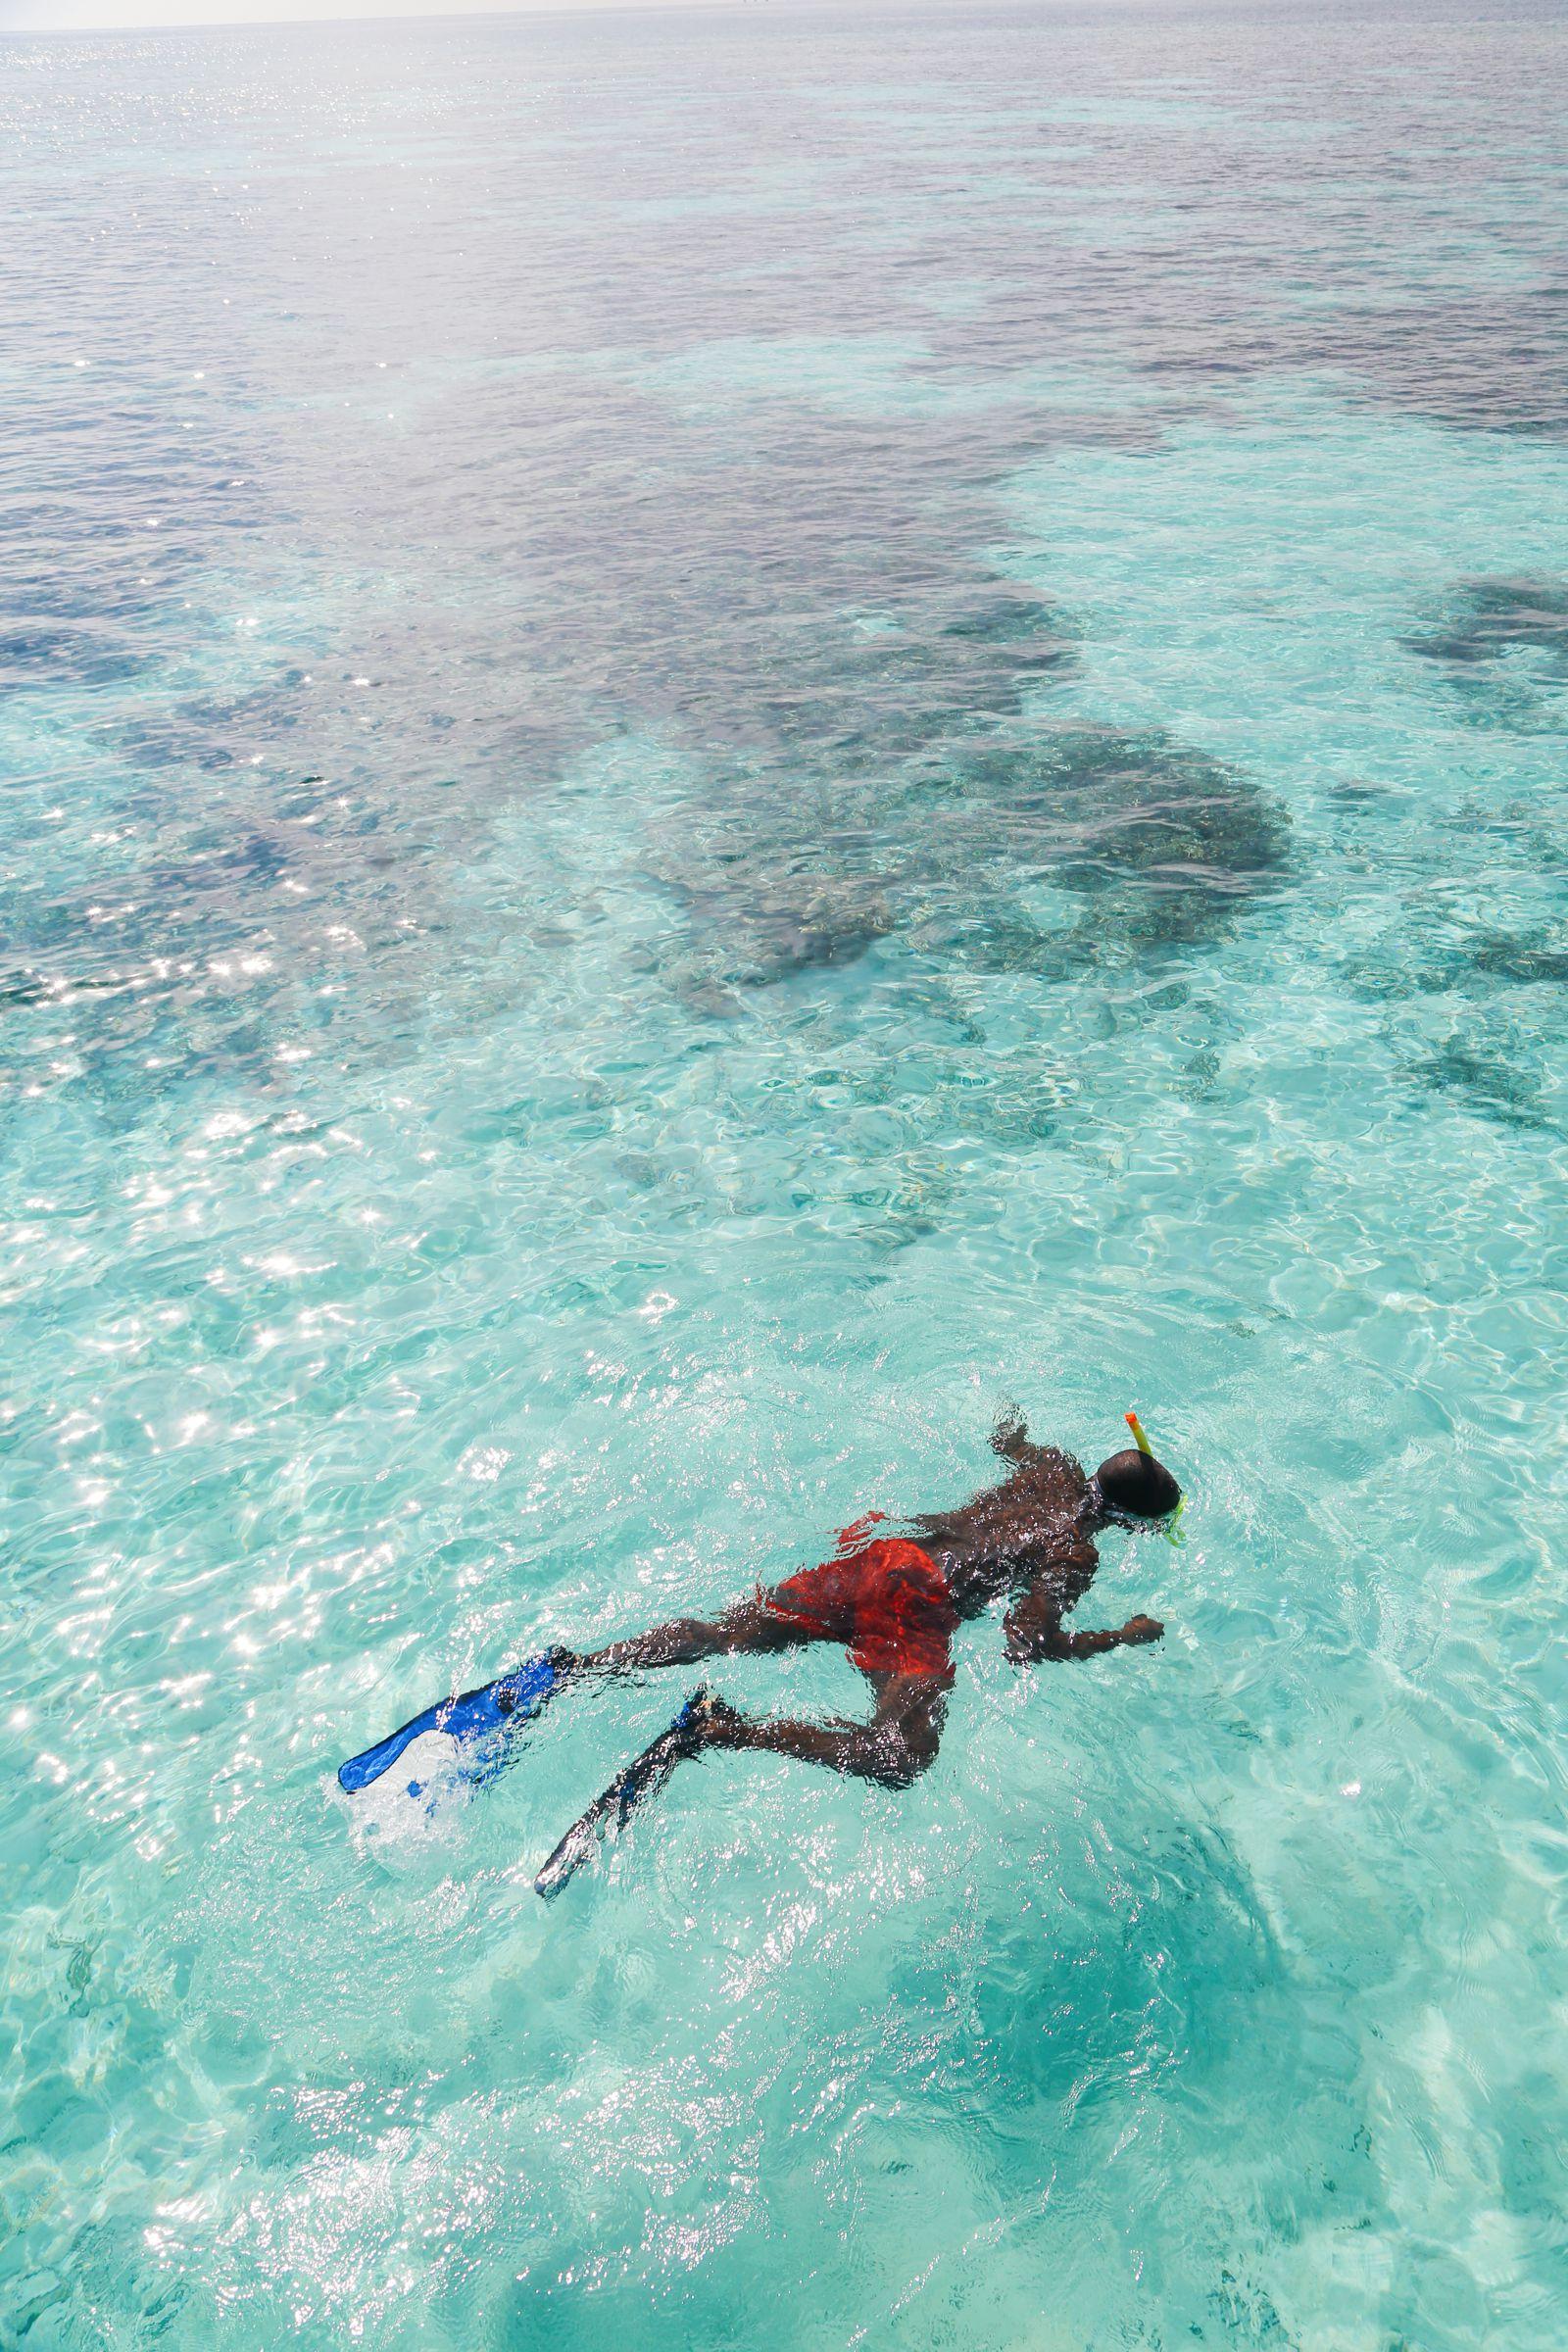 Swimming With Wild Turtles And Those Amazing Island Colours... At Kandolhu Island, Maldives (34)